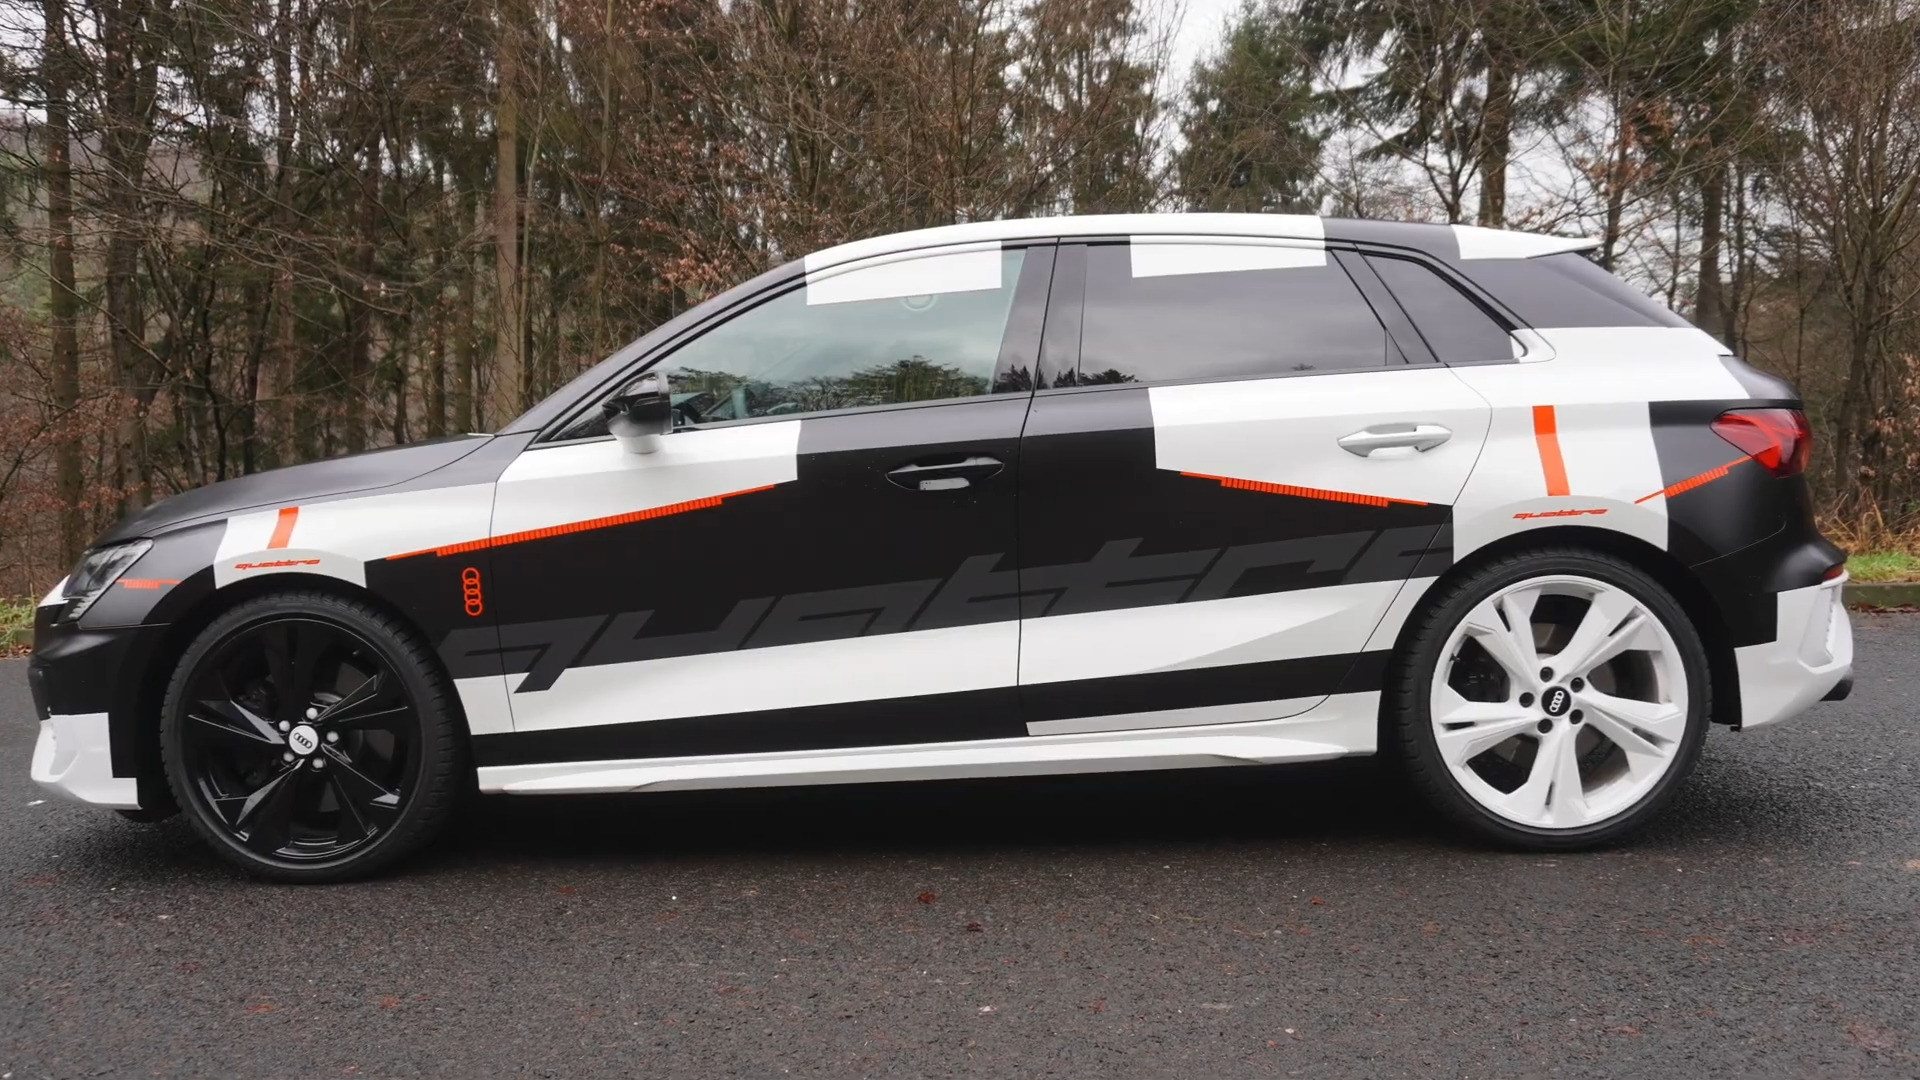 Test, NewGadgets, Johannes Knapp, Audi, 2021 Audi S3, Audi S3, Audi MMI plus, Virtual Cockpit Plus